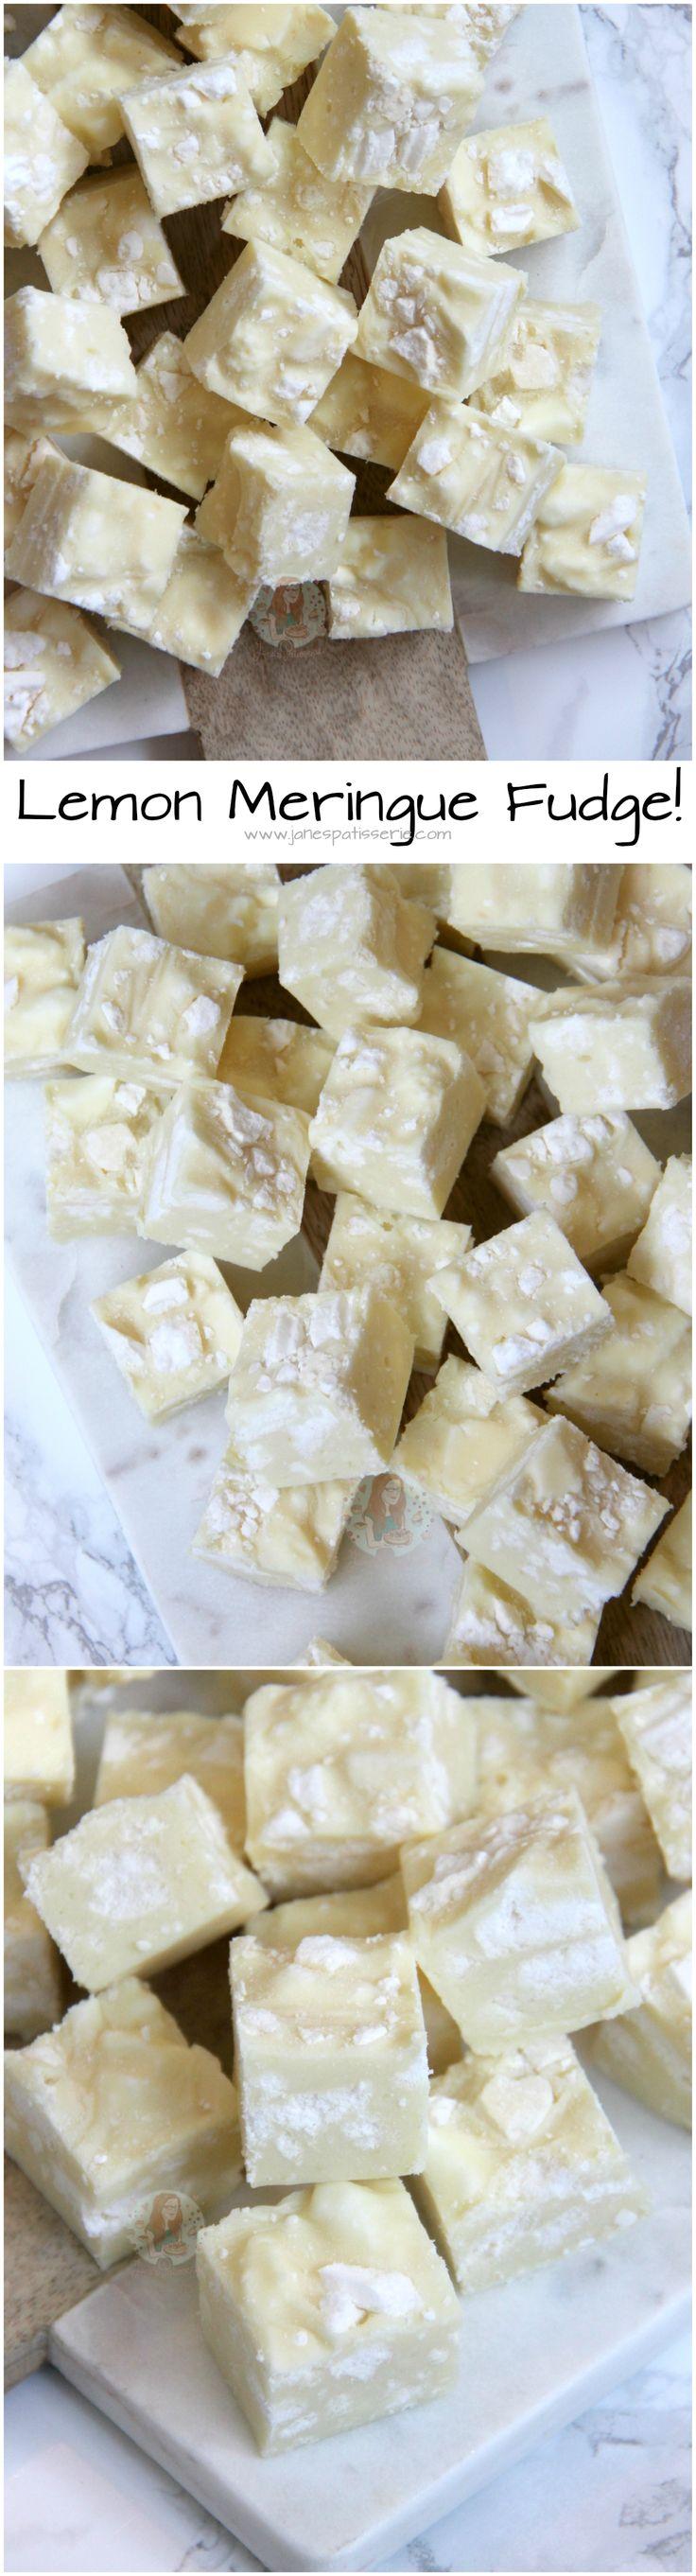 Easy Microwave Fudge Recipe - thespruceeats.com